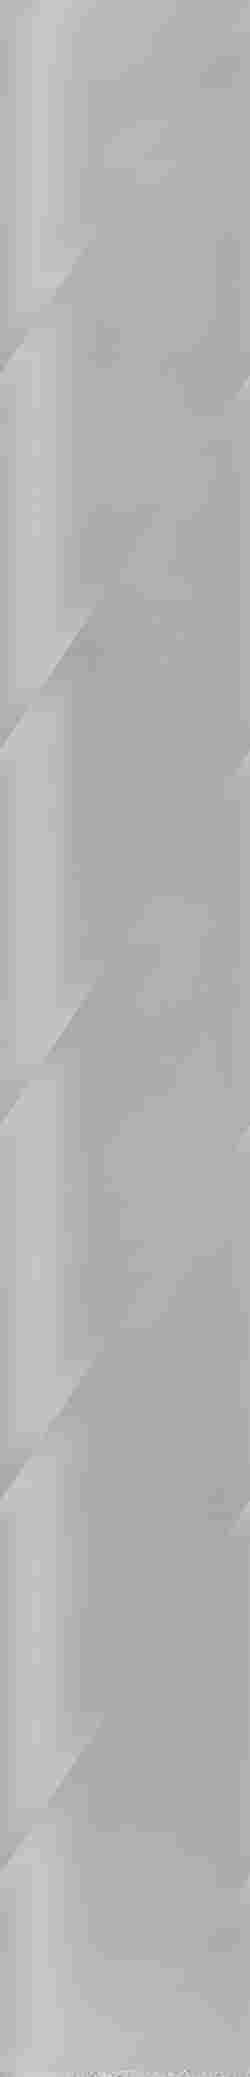 Paradyż Naturstone Antracite Cokół Mat. (Profil Mat)